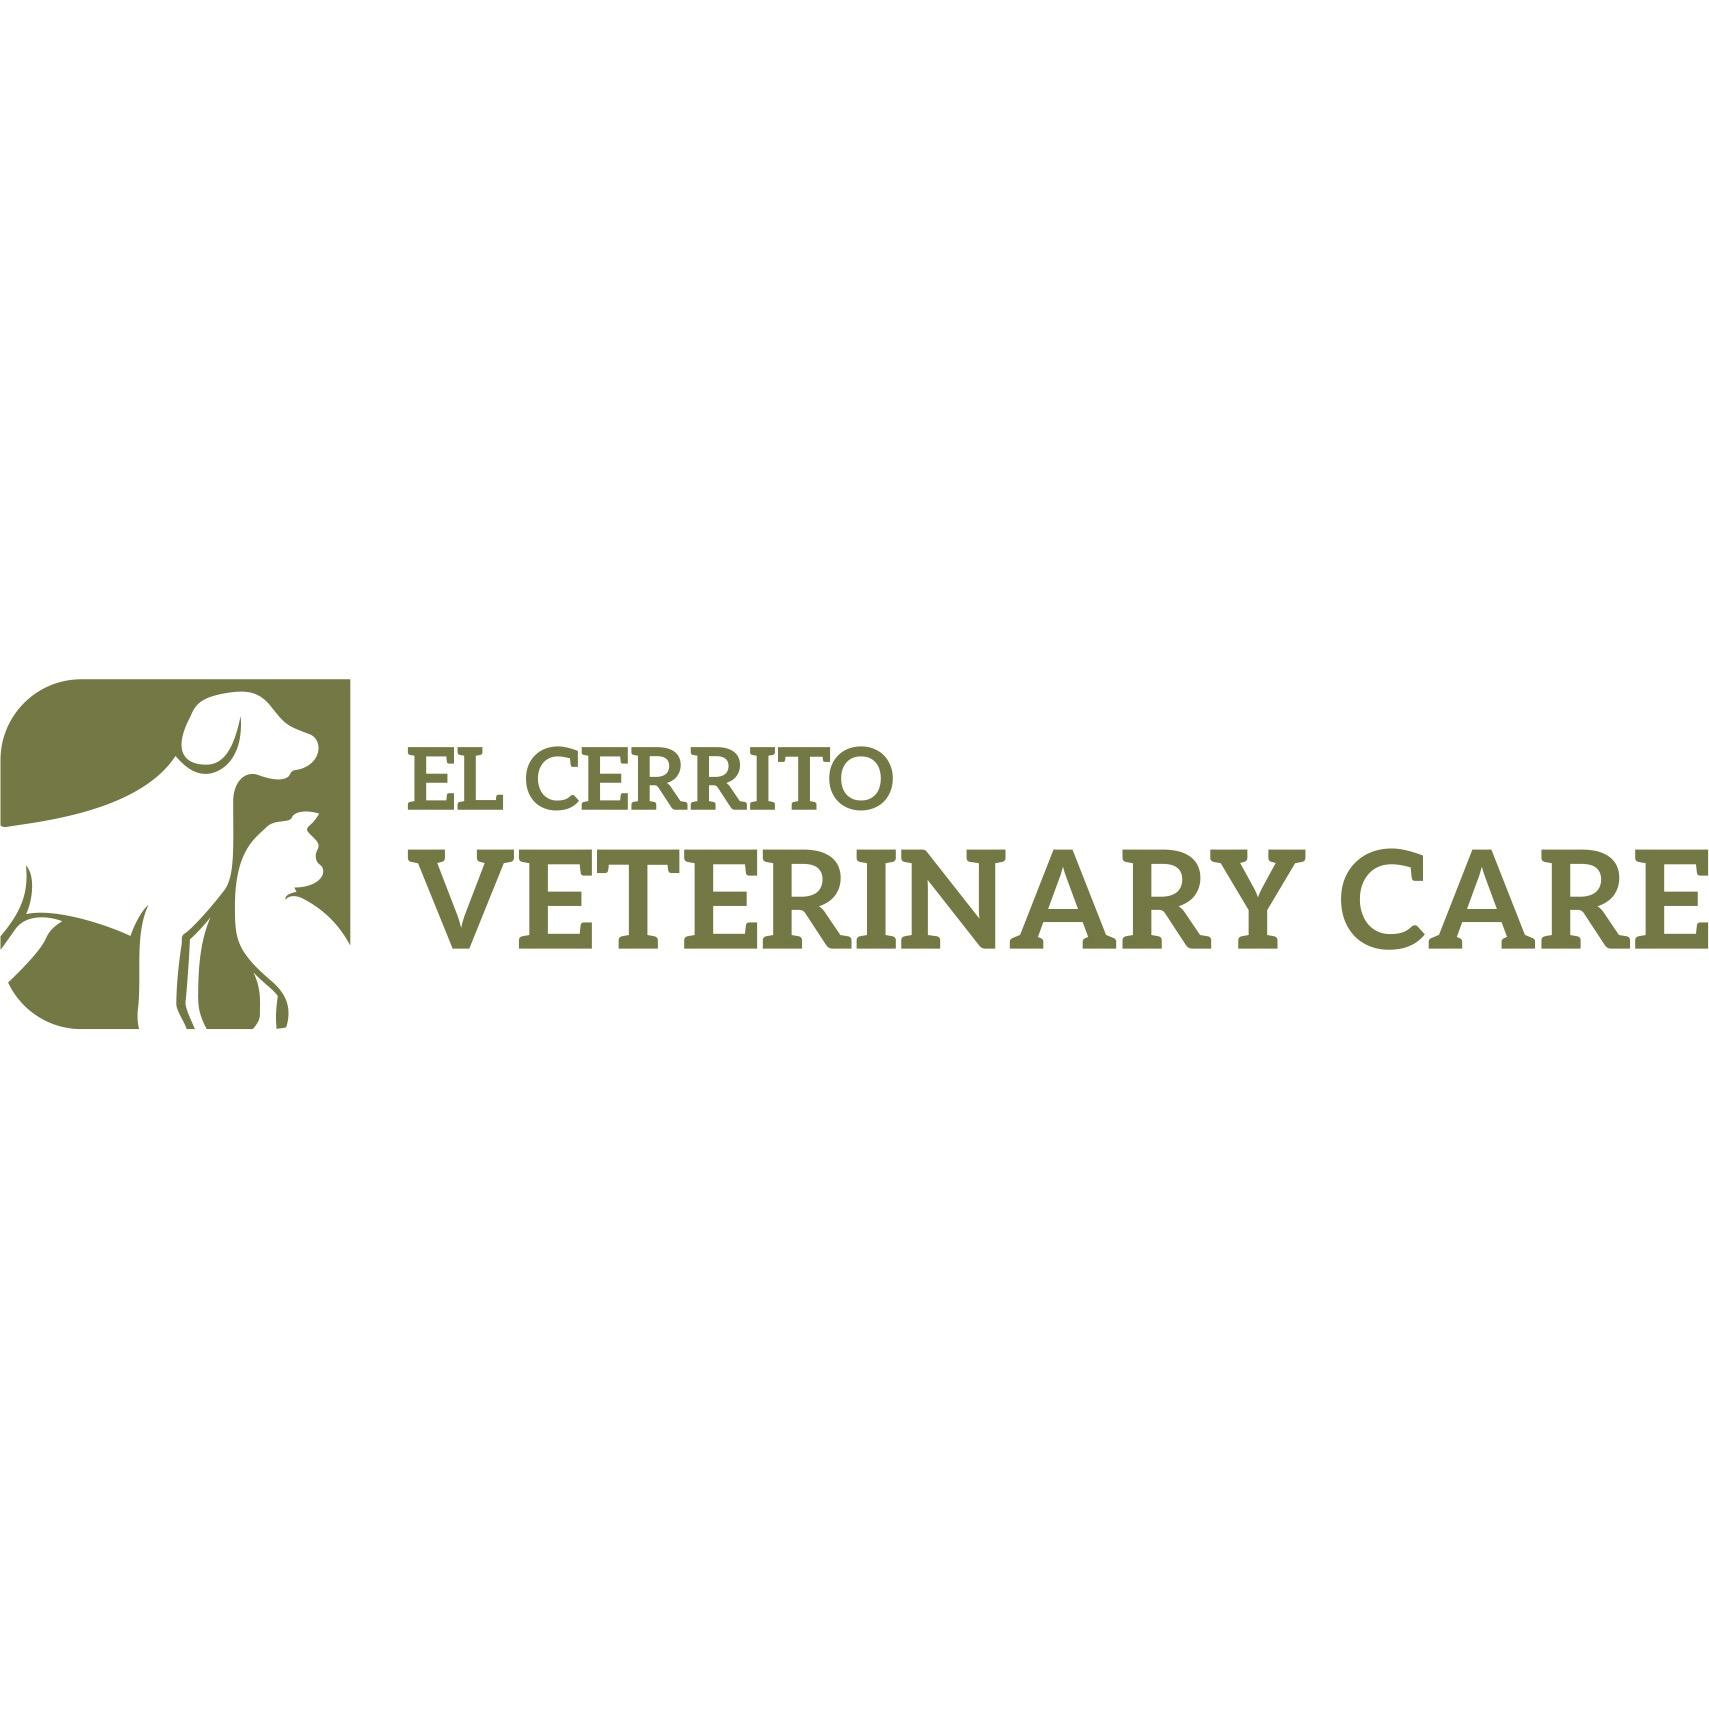 El Cerrito Veterinary Care - El Cerrito, CA 94530 - (510)529-4355 | ShowMeLocal.com